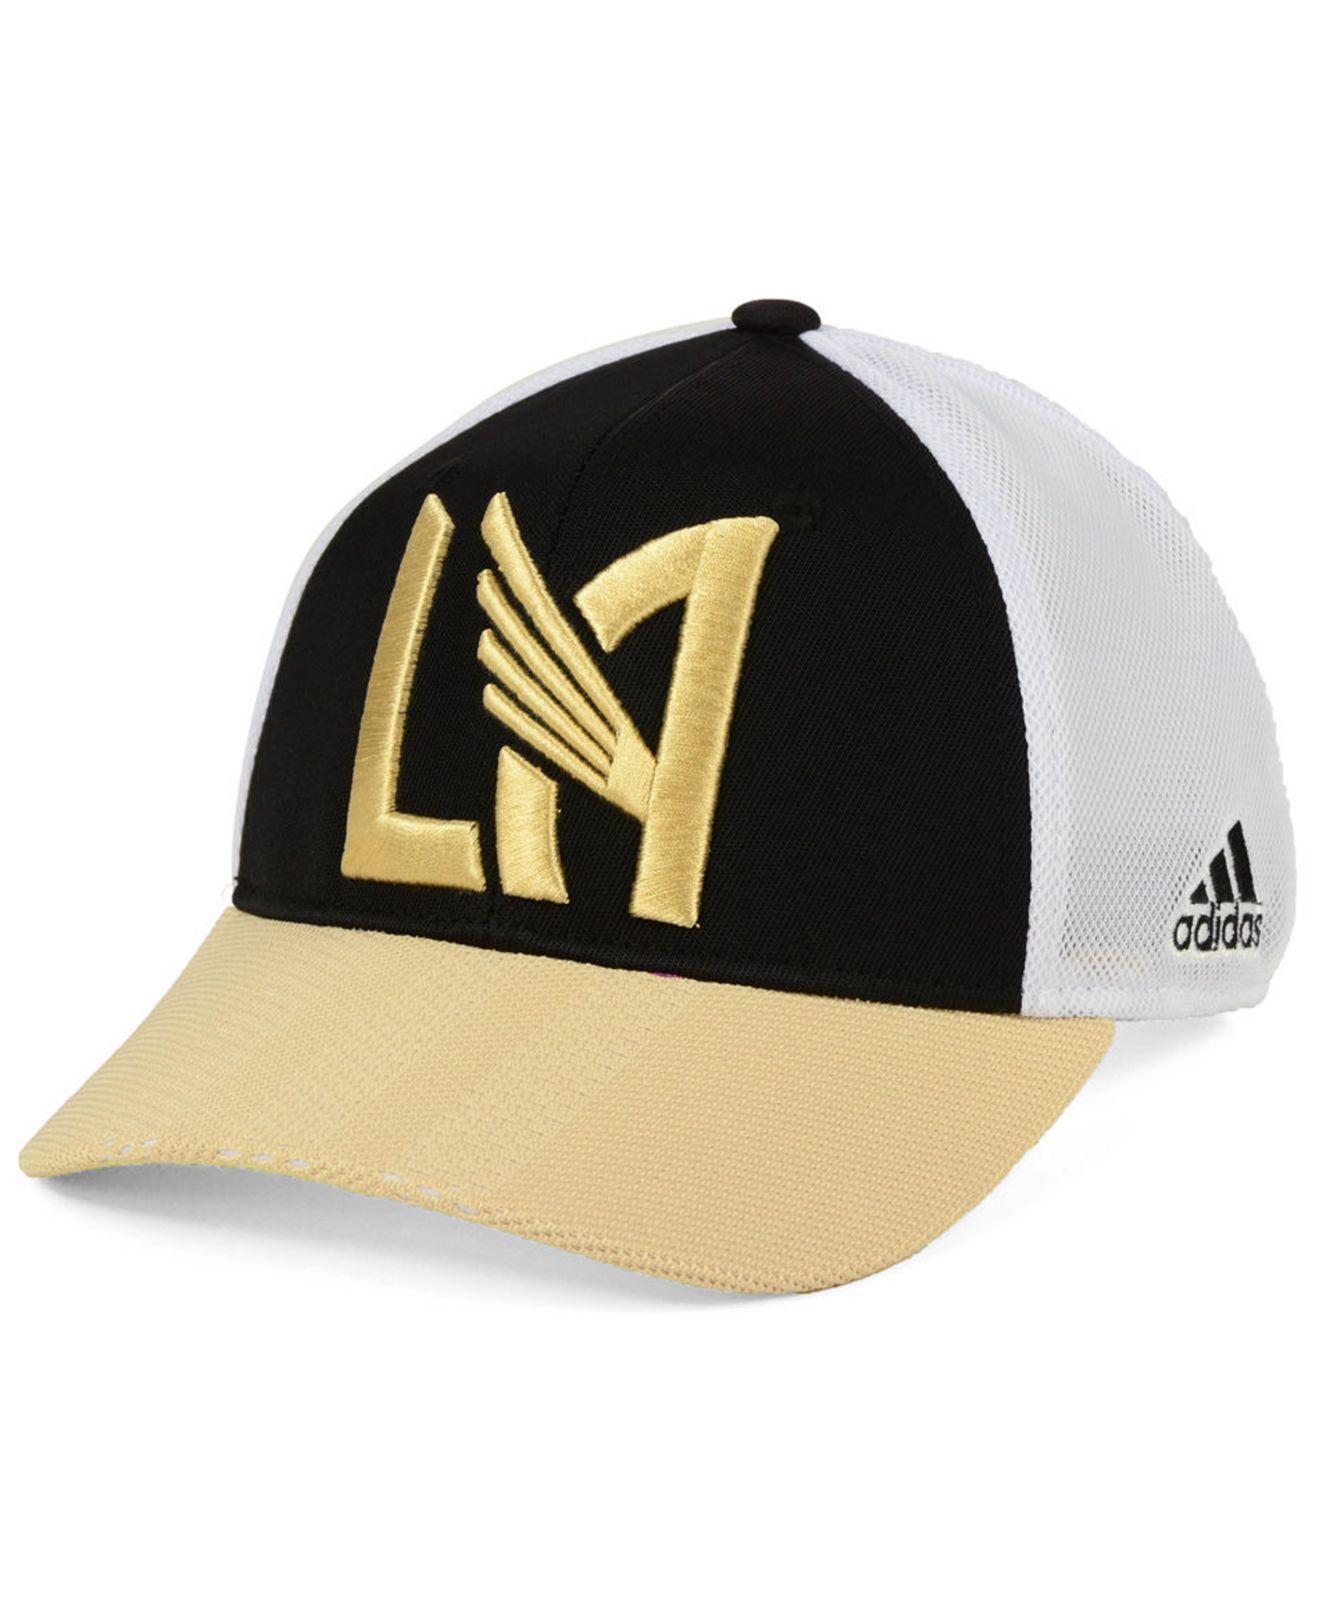 buy online de646 00e07 ... sports fan shop by lids men macys 26a77 f603c  new zealand adidas black  los angeles football club authentic mesh adjustable cap for men lyst.